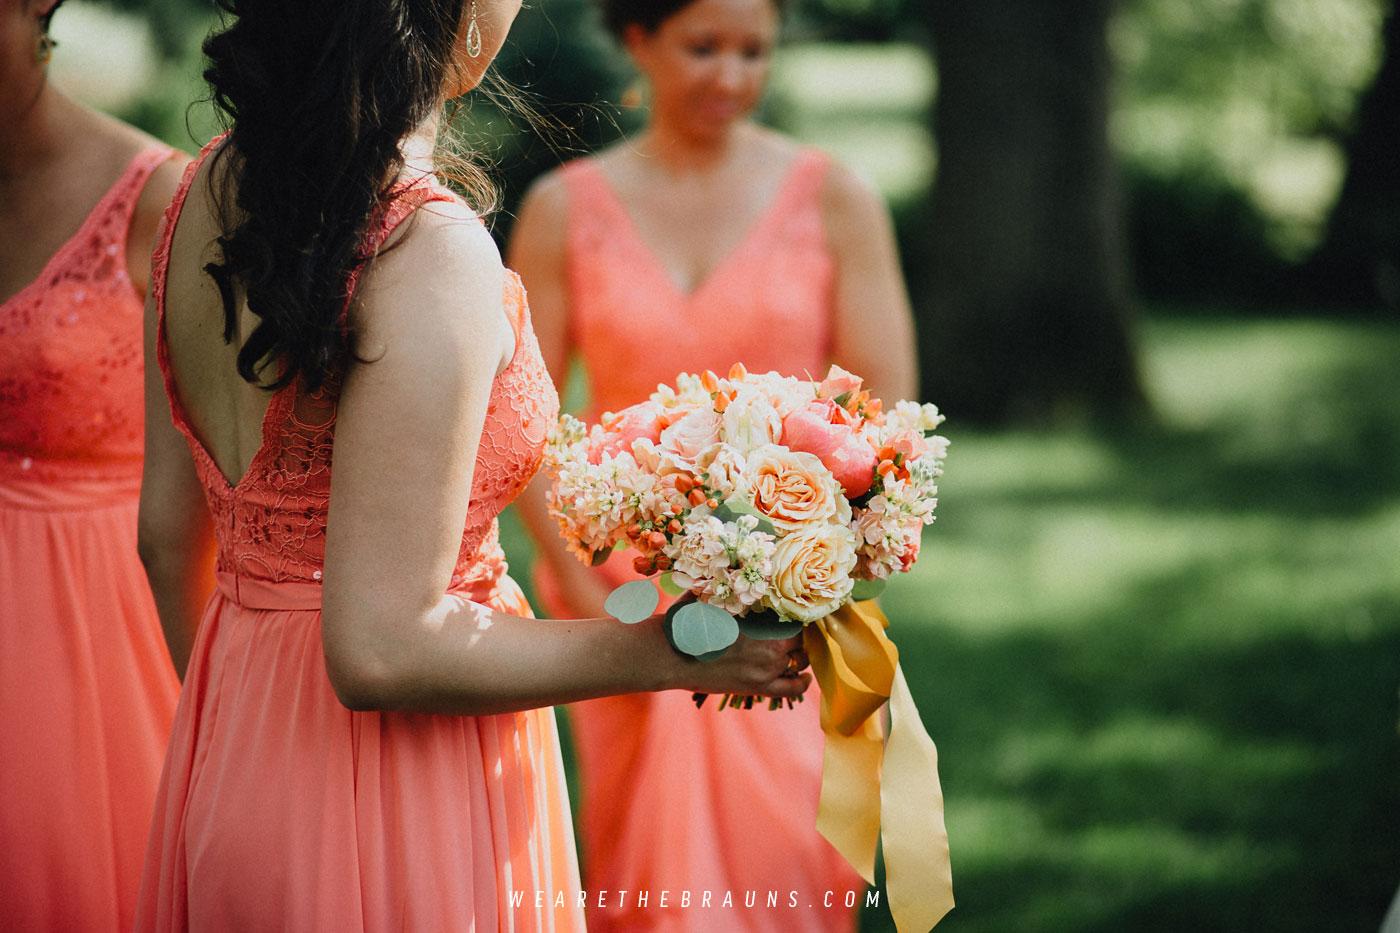 Stephanie-Ryan-Bridal-Party-074.jpg